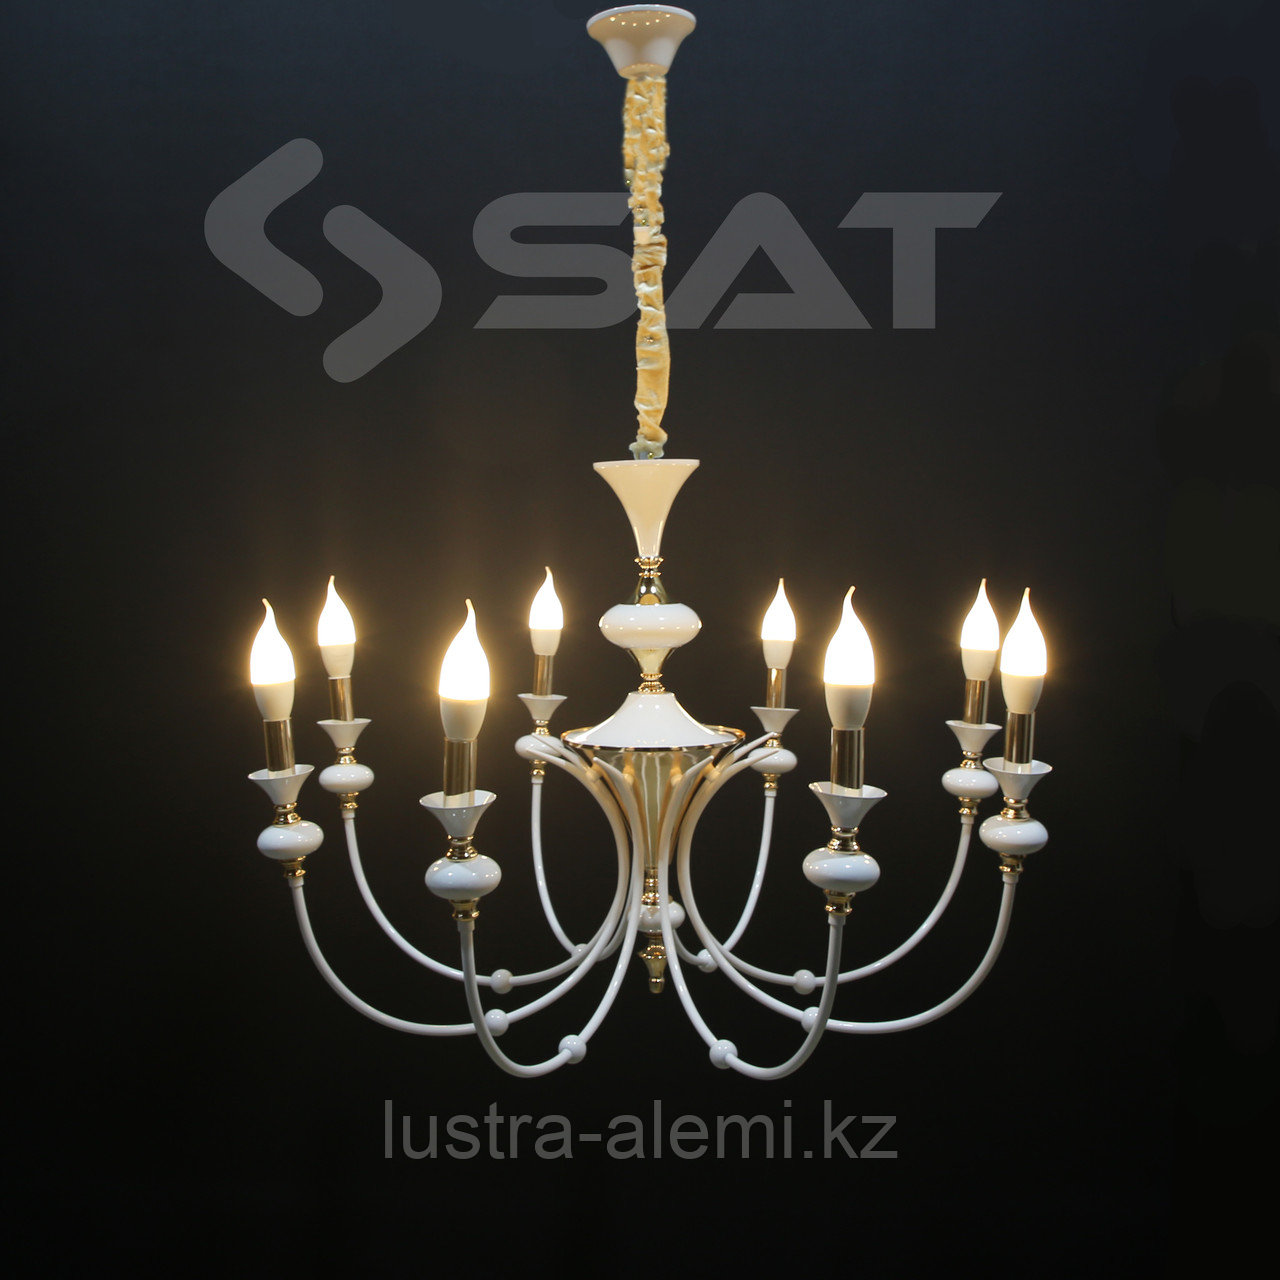 Люстра Нео-Классика 88130/8+4 WH+SGD E14*12